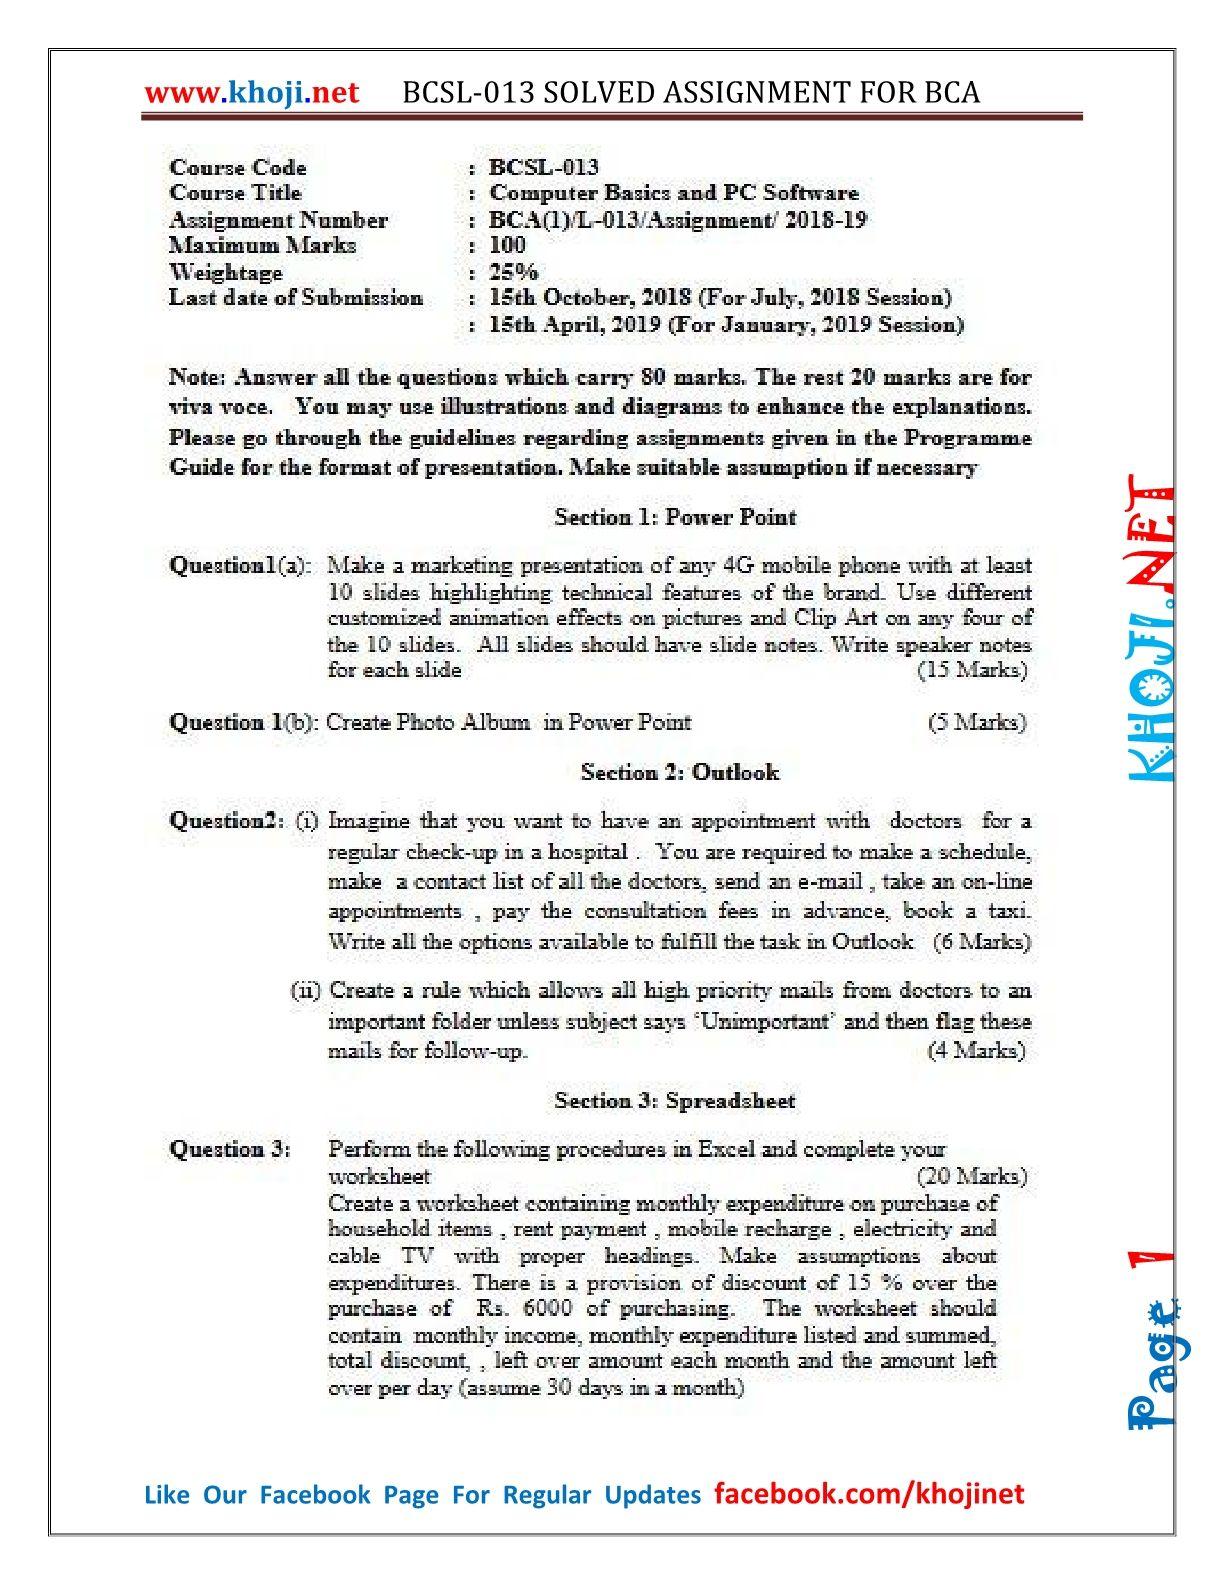 BCSL-013 Solved Assignment 2018-19 IGNOU BCA 1st Semester PDF Solution